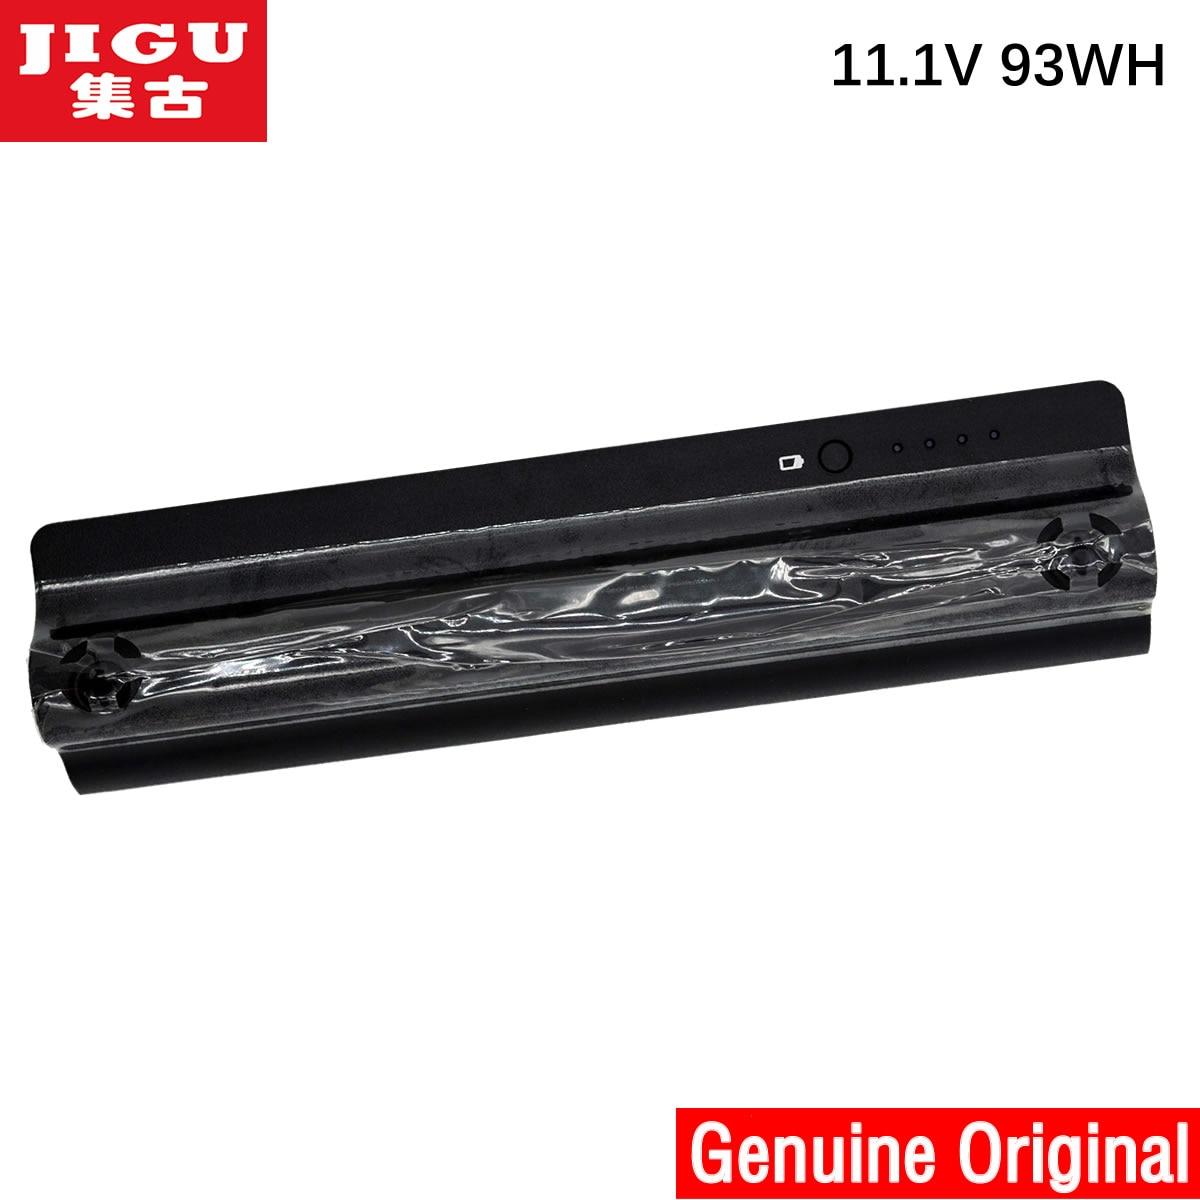 Jigu оригинальный ноутбук Батарея для HP DV3 DM4 DV5 <font><b>DV6</b></font> DV7 G4 G6 G7 635 CQ56 G32 G42 G72 MU06 593553-001 593554-001 93WH